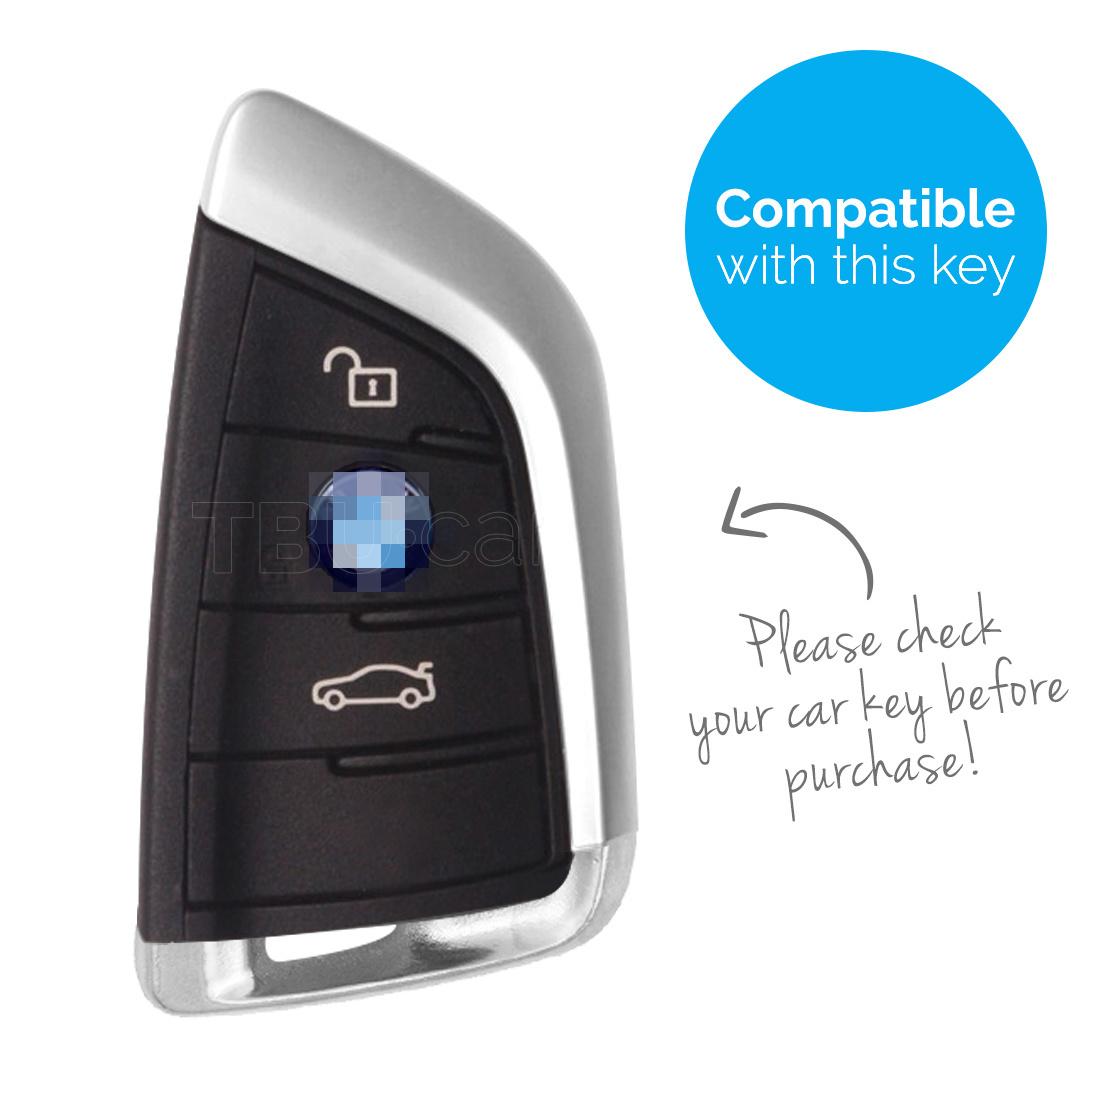 TBU car TBU car Sleutel cover compatibel met BMW - Silicone sleutelhoesje - beschermhoesje autosleutel - Zwart